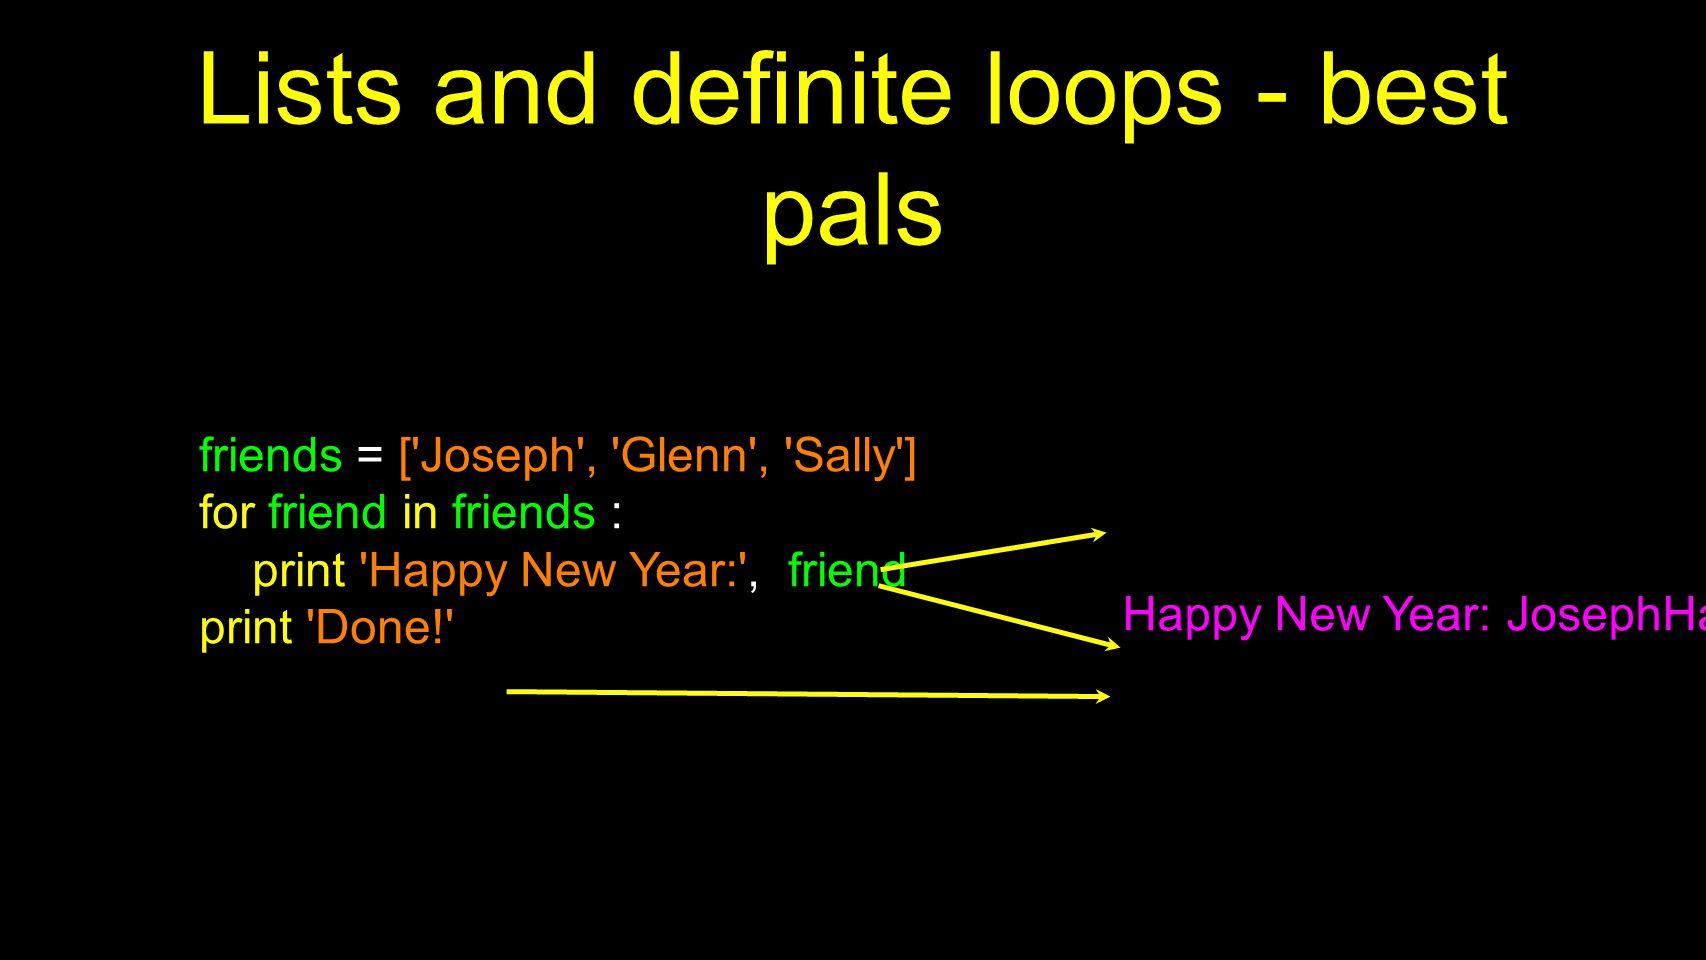 Lists and definite loops - best pals friends = ['Joseph', 'Glenn', 'Sally'] for friend in friends : print 'Happy New Year:', friend print 'Done!' Happ